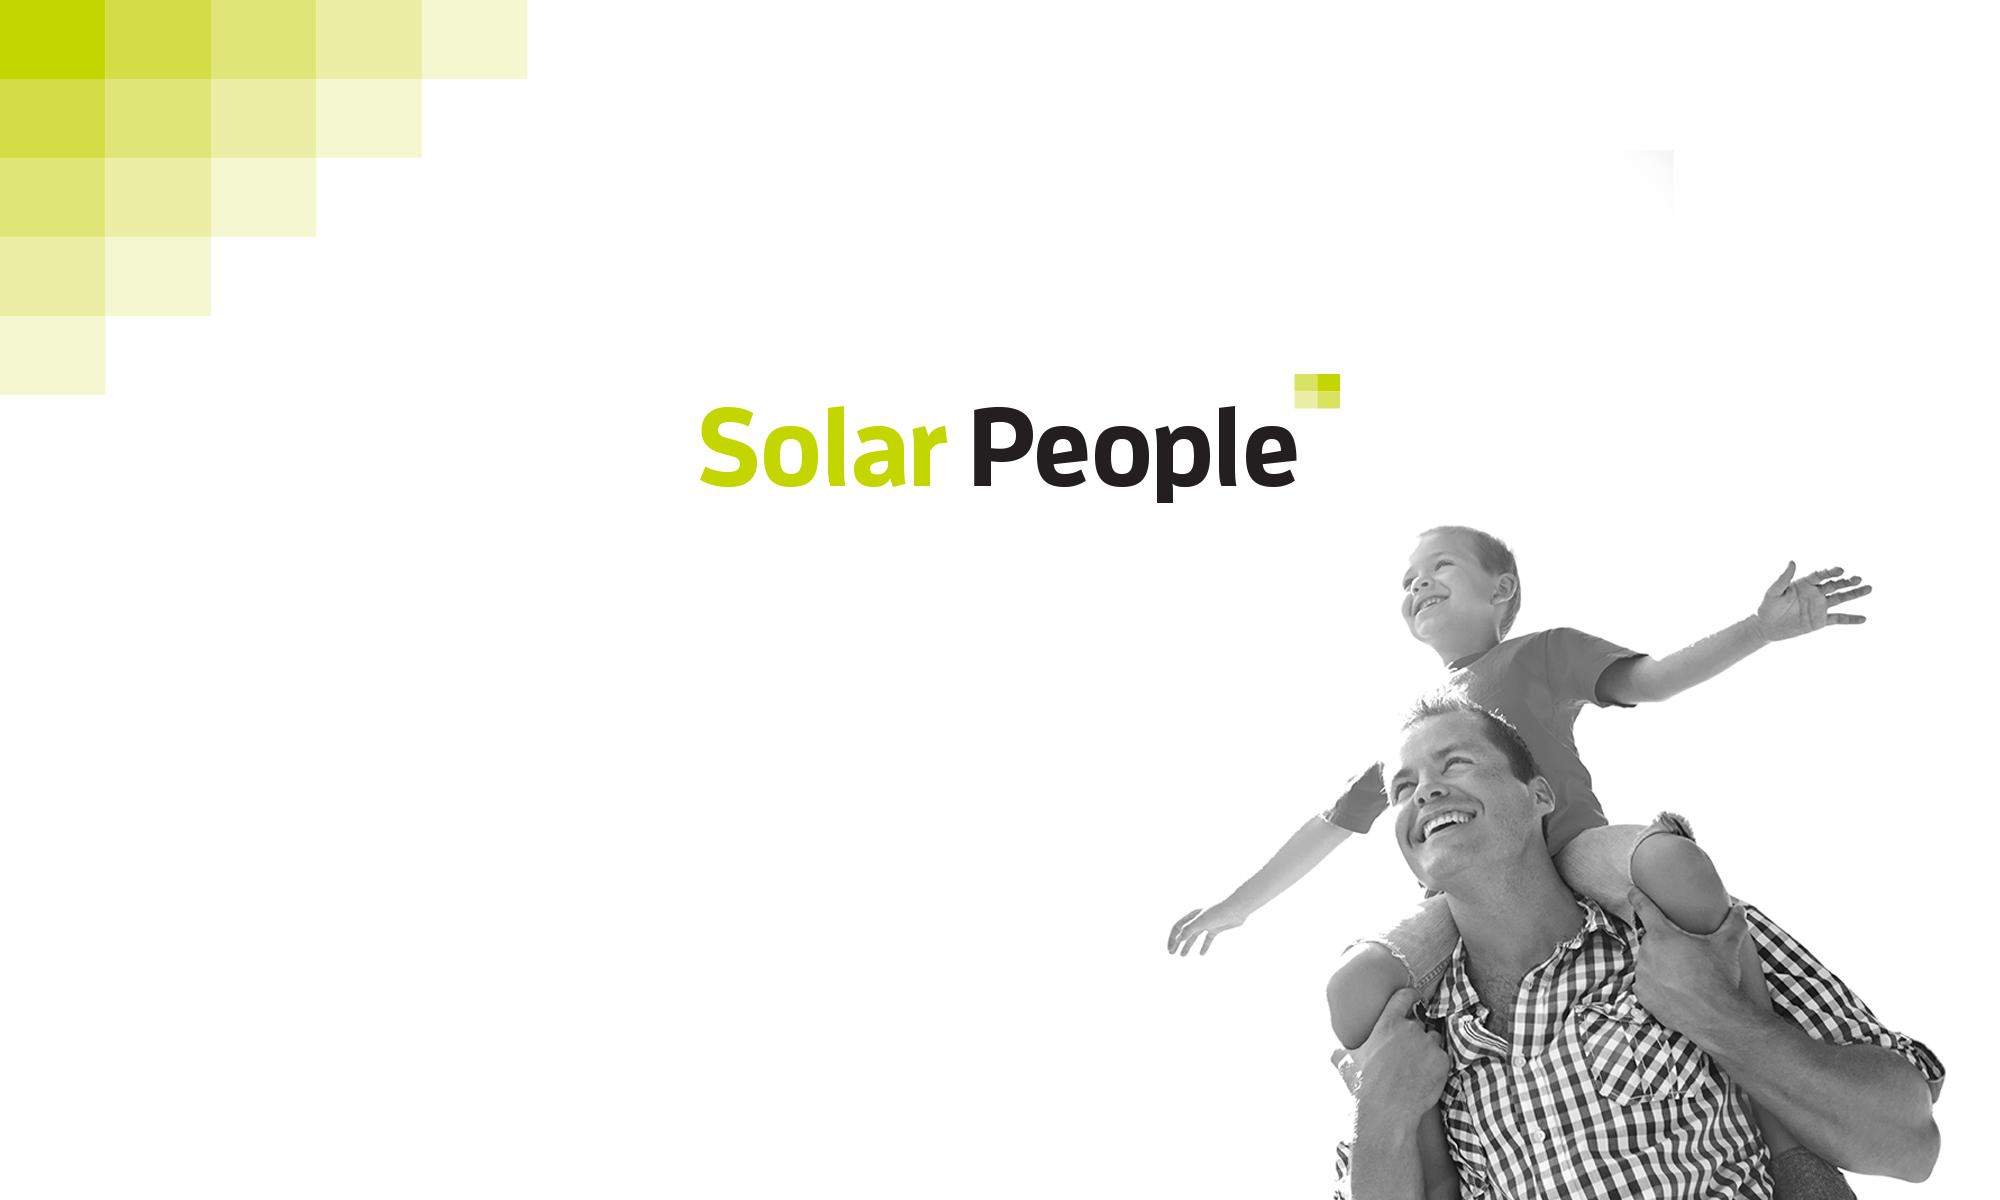 Solar People